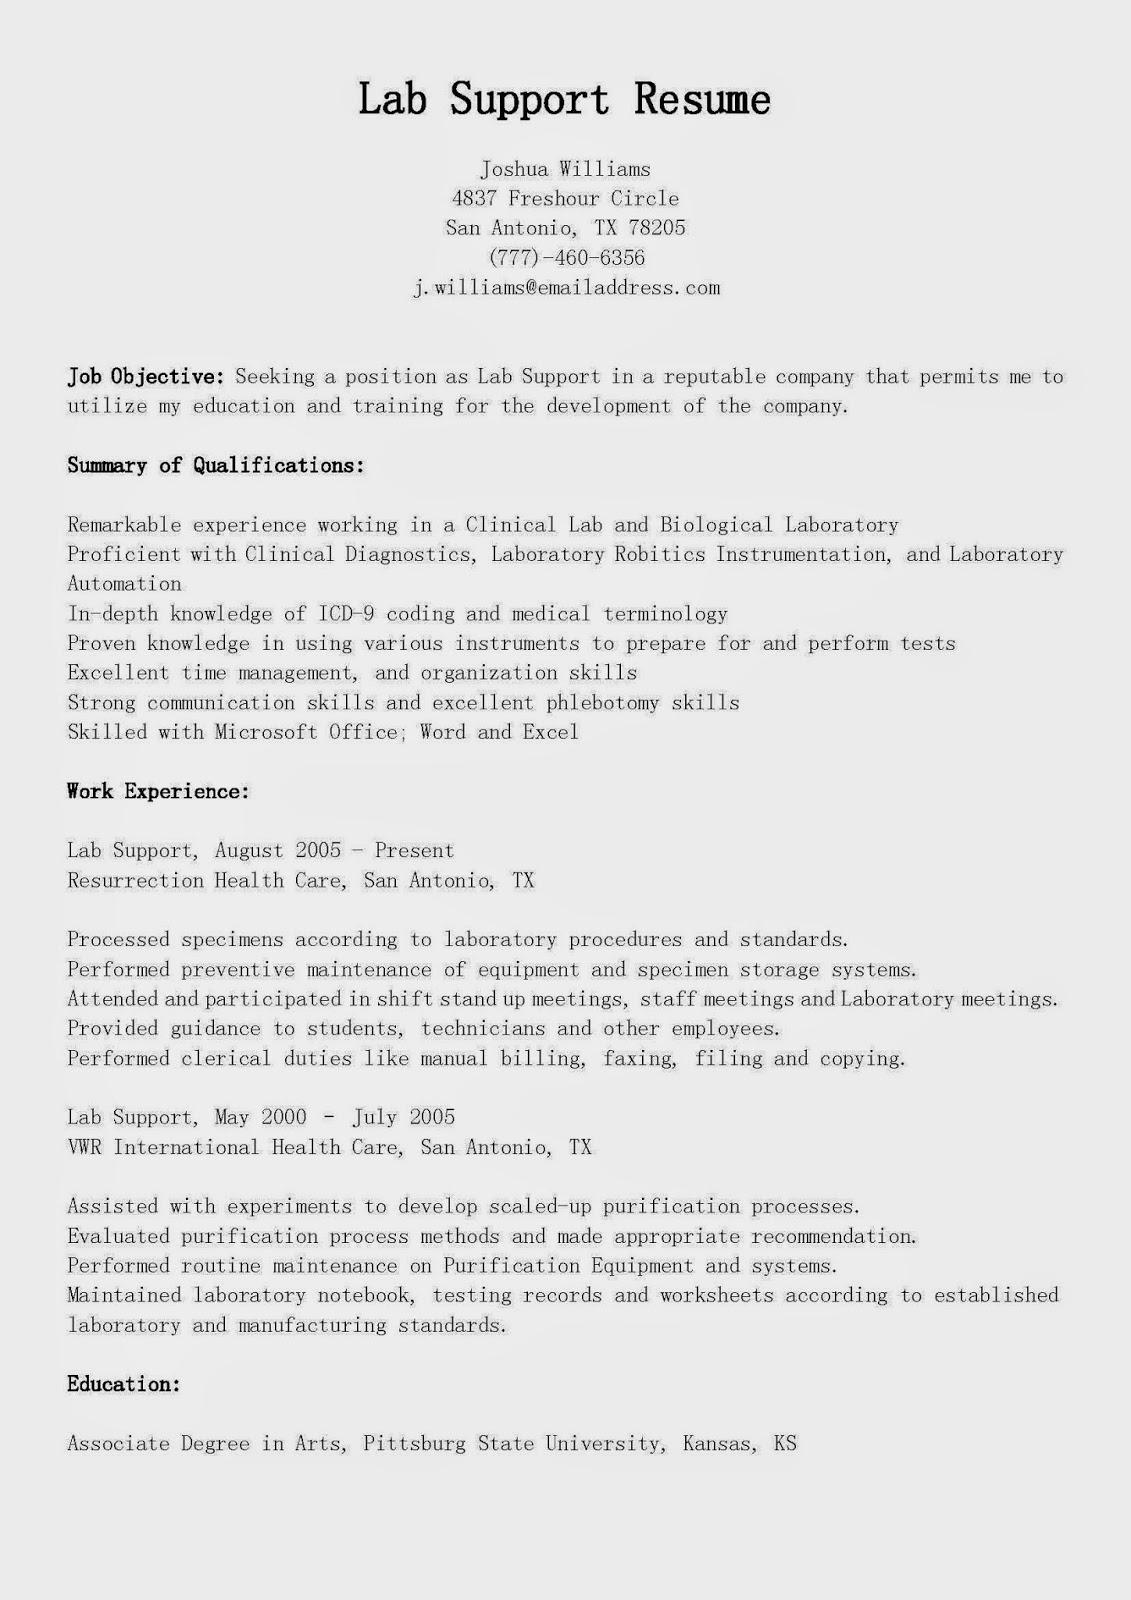 resume samples  lab support resume sample